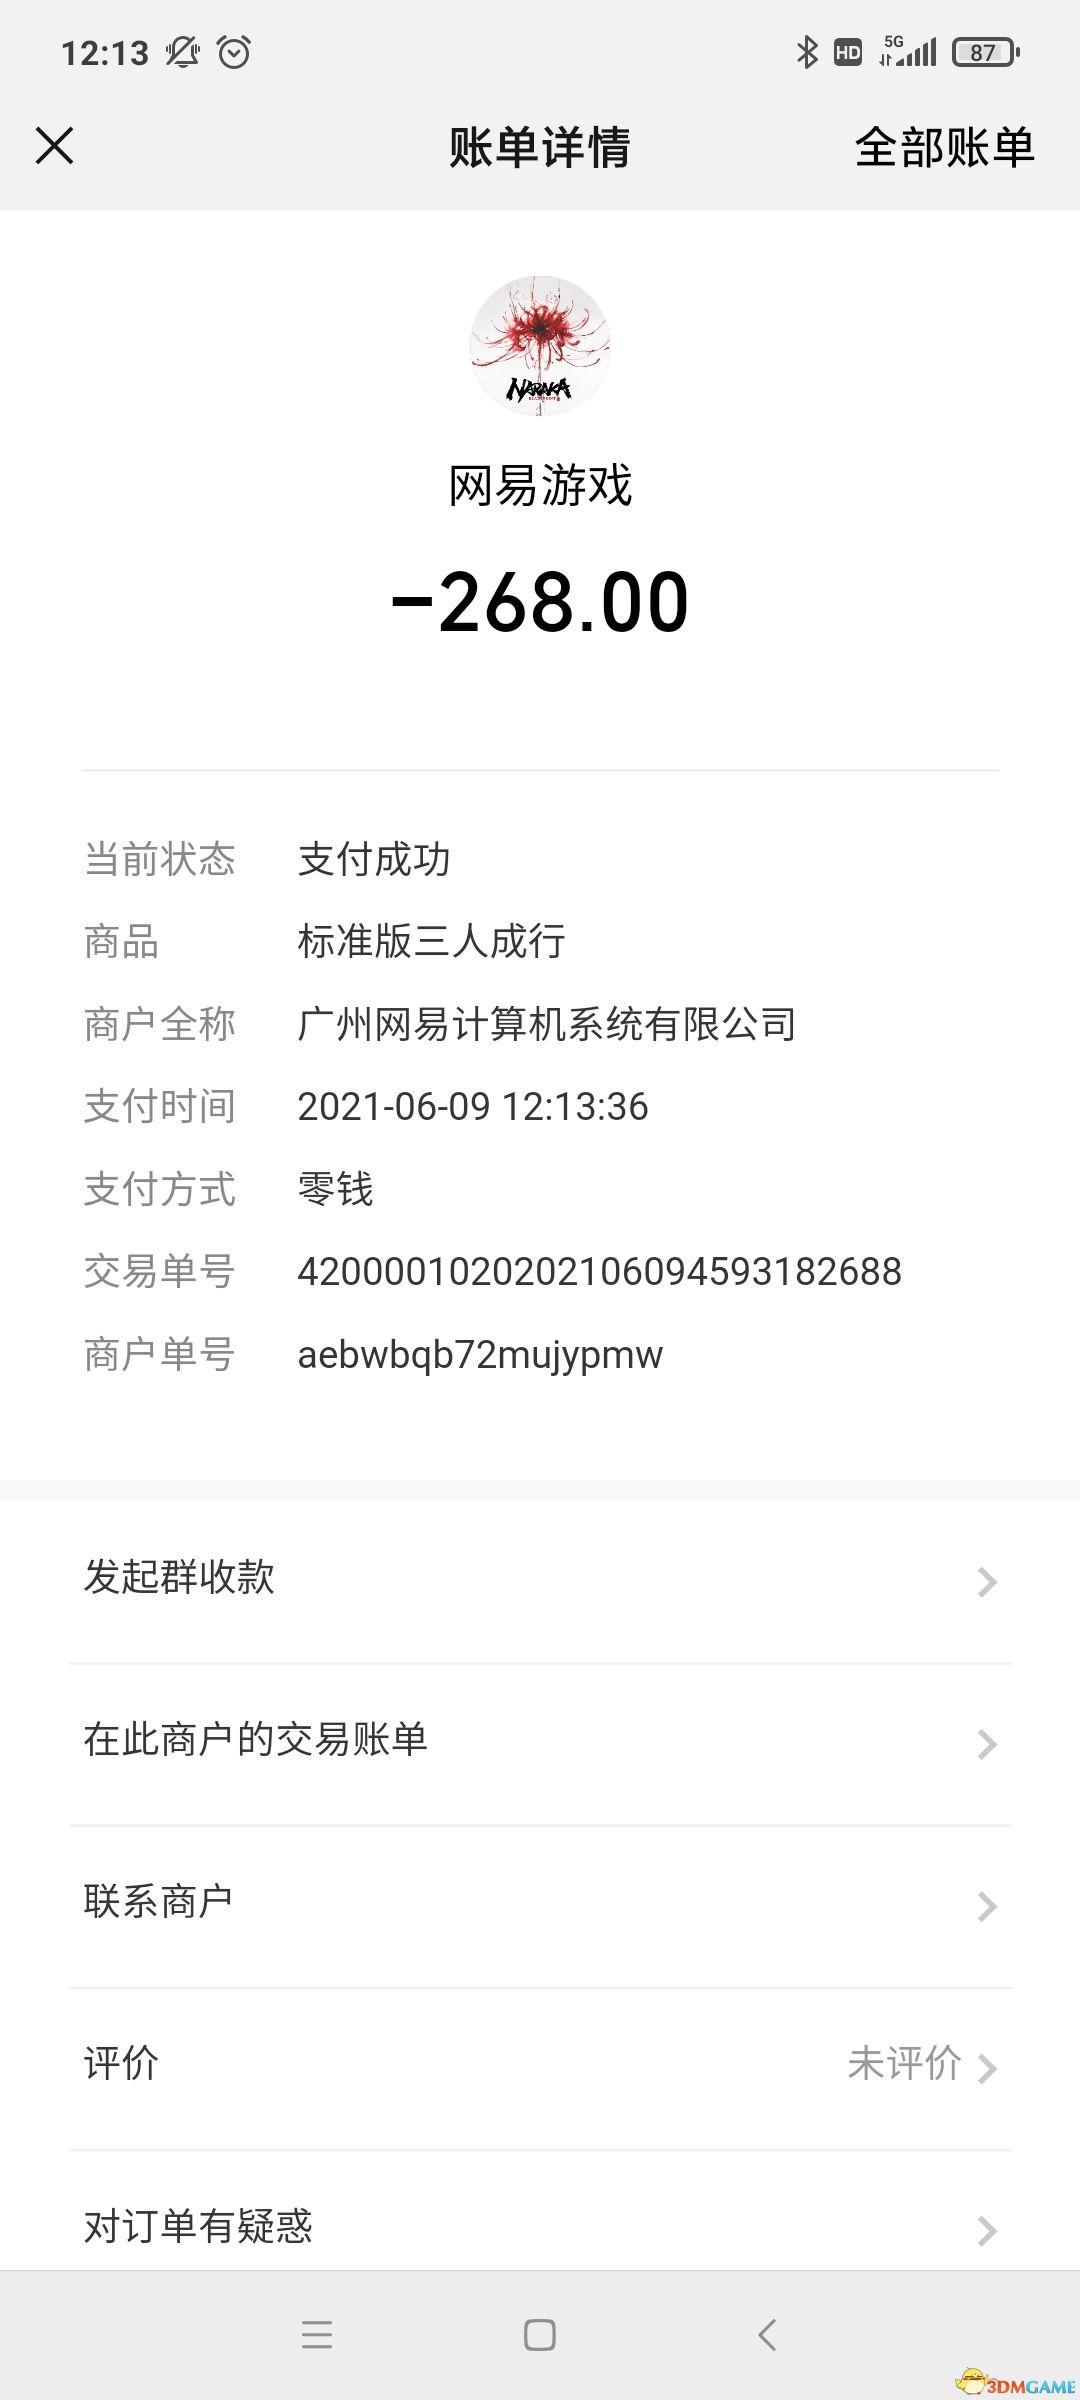 Screenshot_2021-06-09-12-13-48-715_com.tencent.mm.jpg